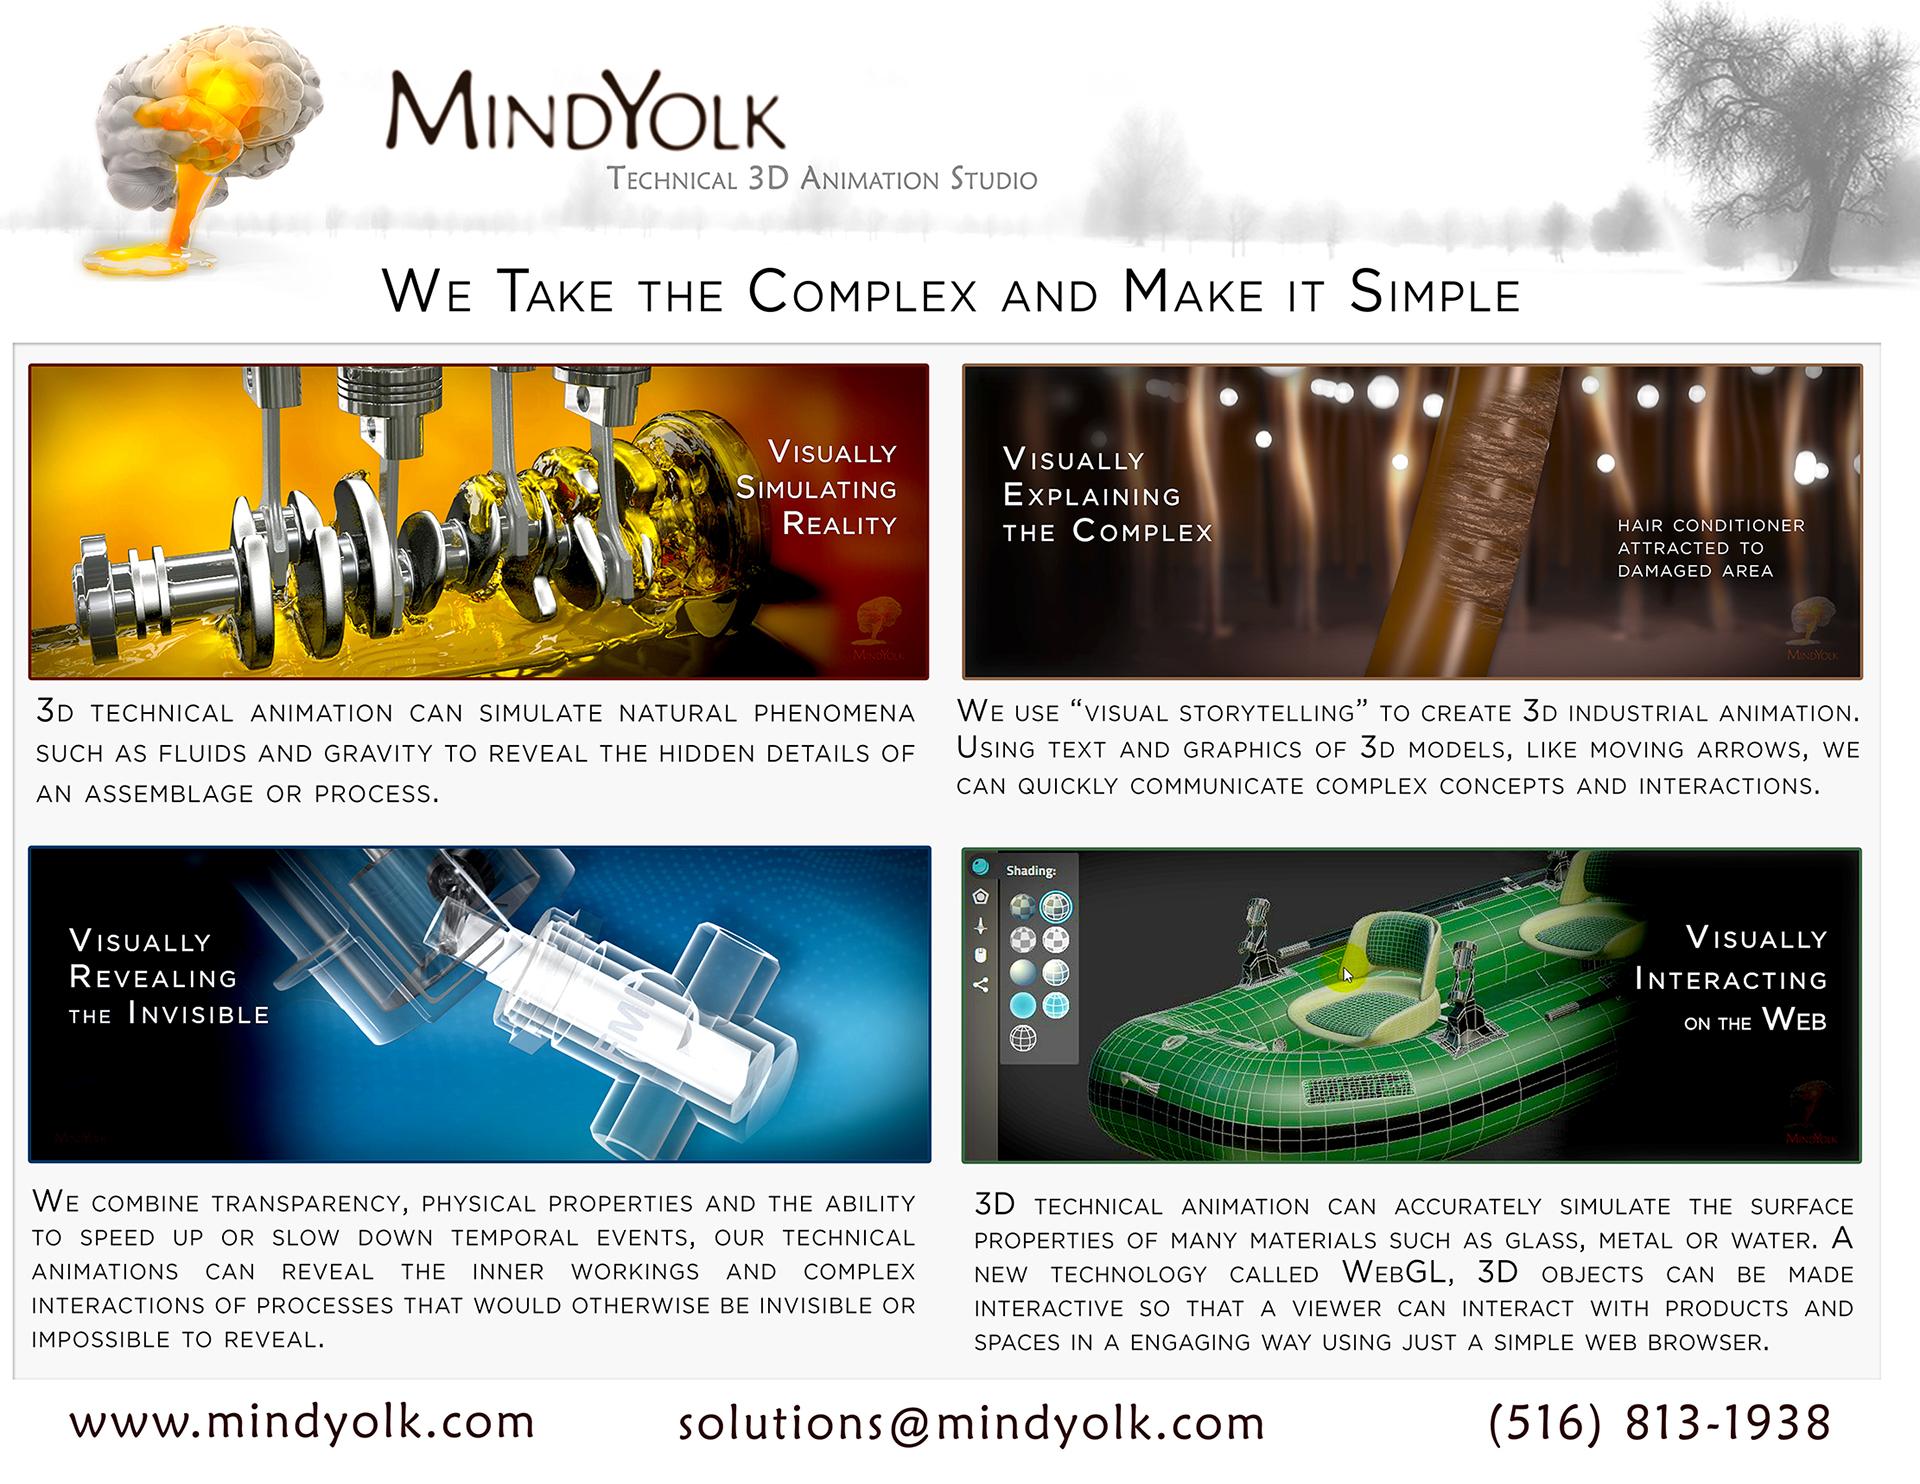 MindYolk Technical 3D Animation Studio on Behance